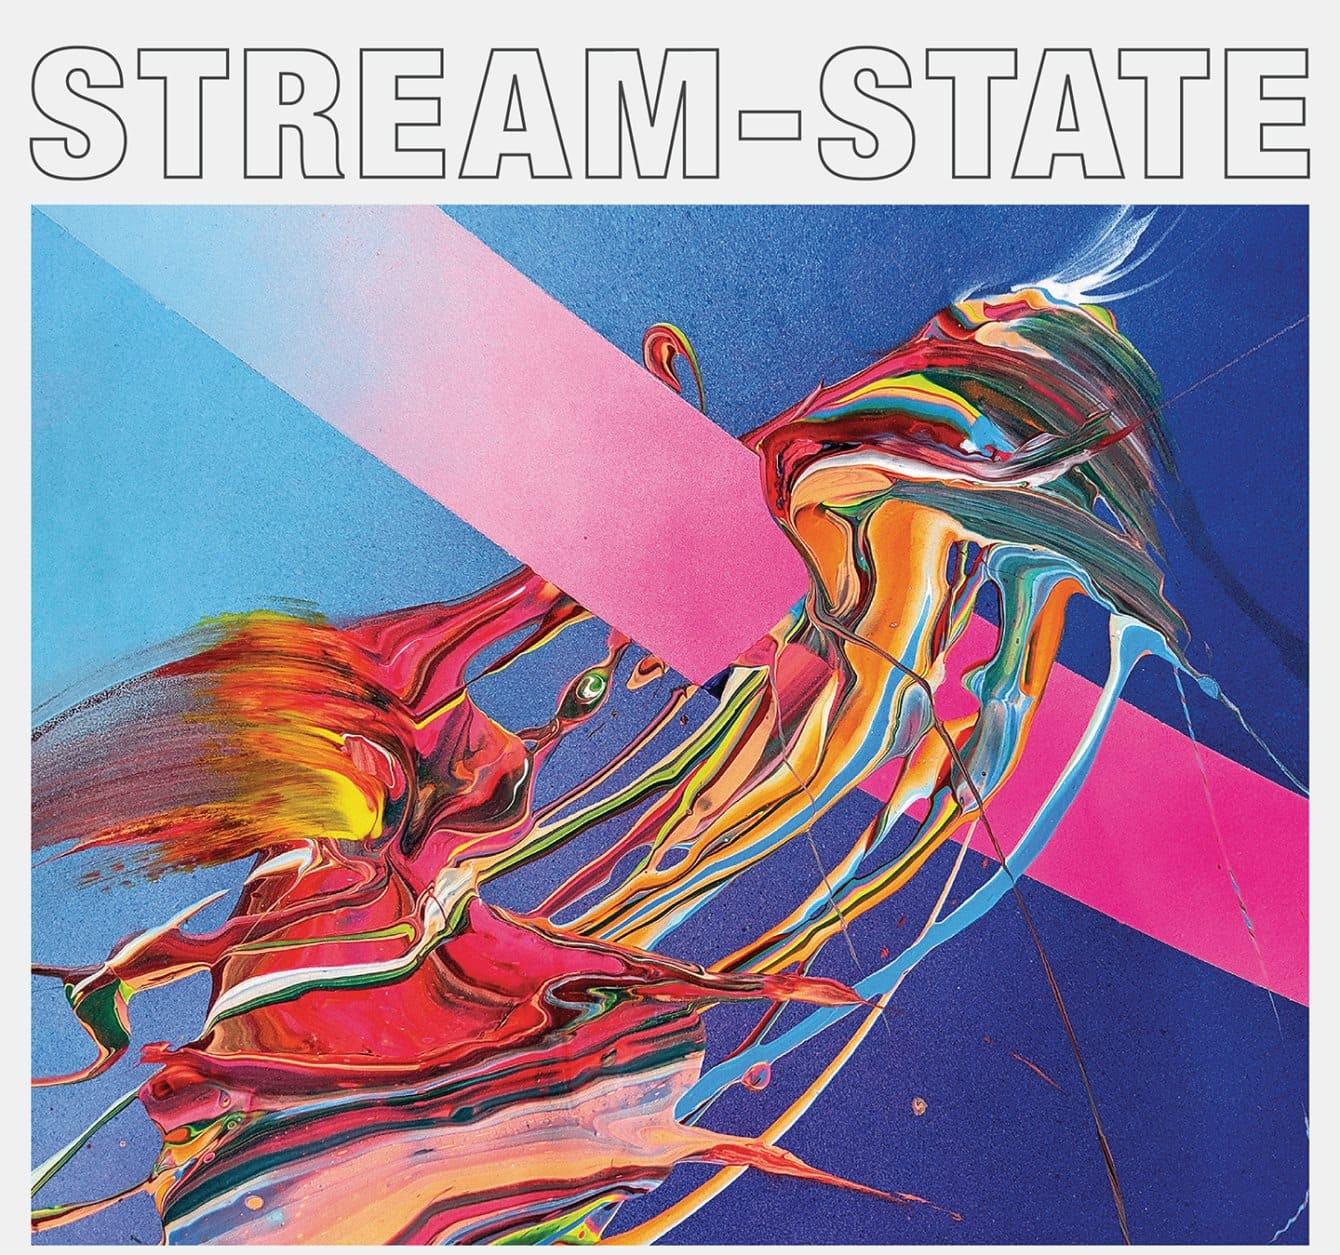 Ed Davenport annuncia Stream State